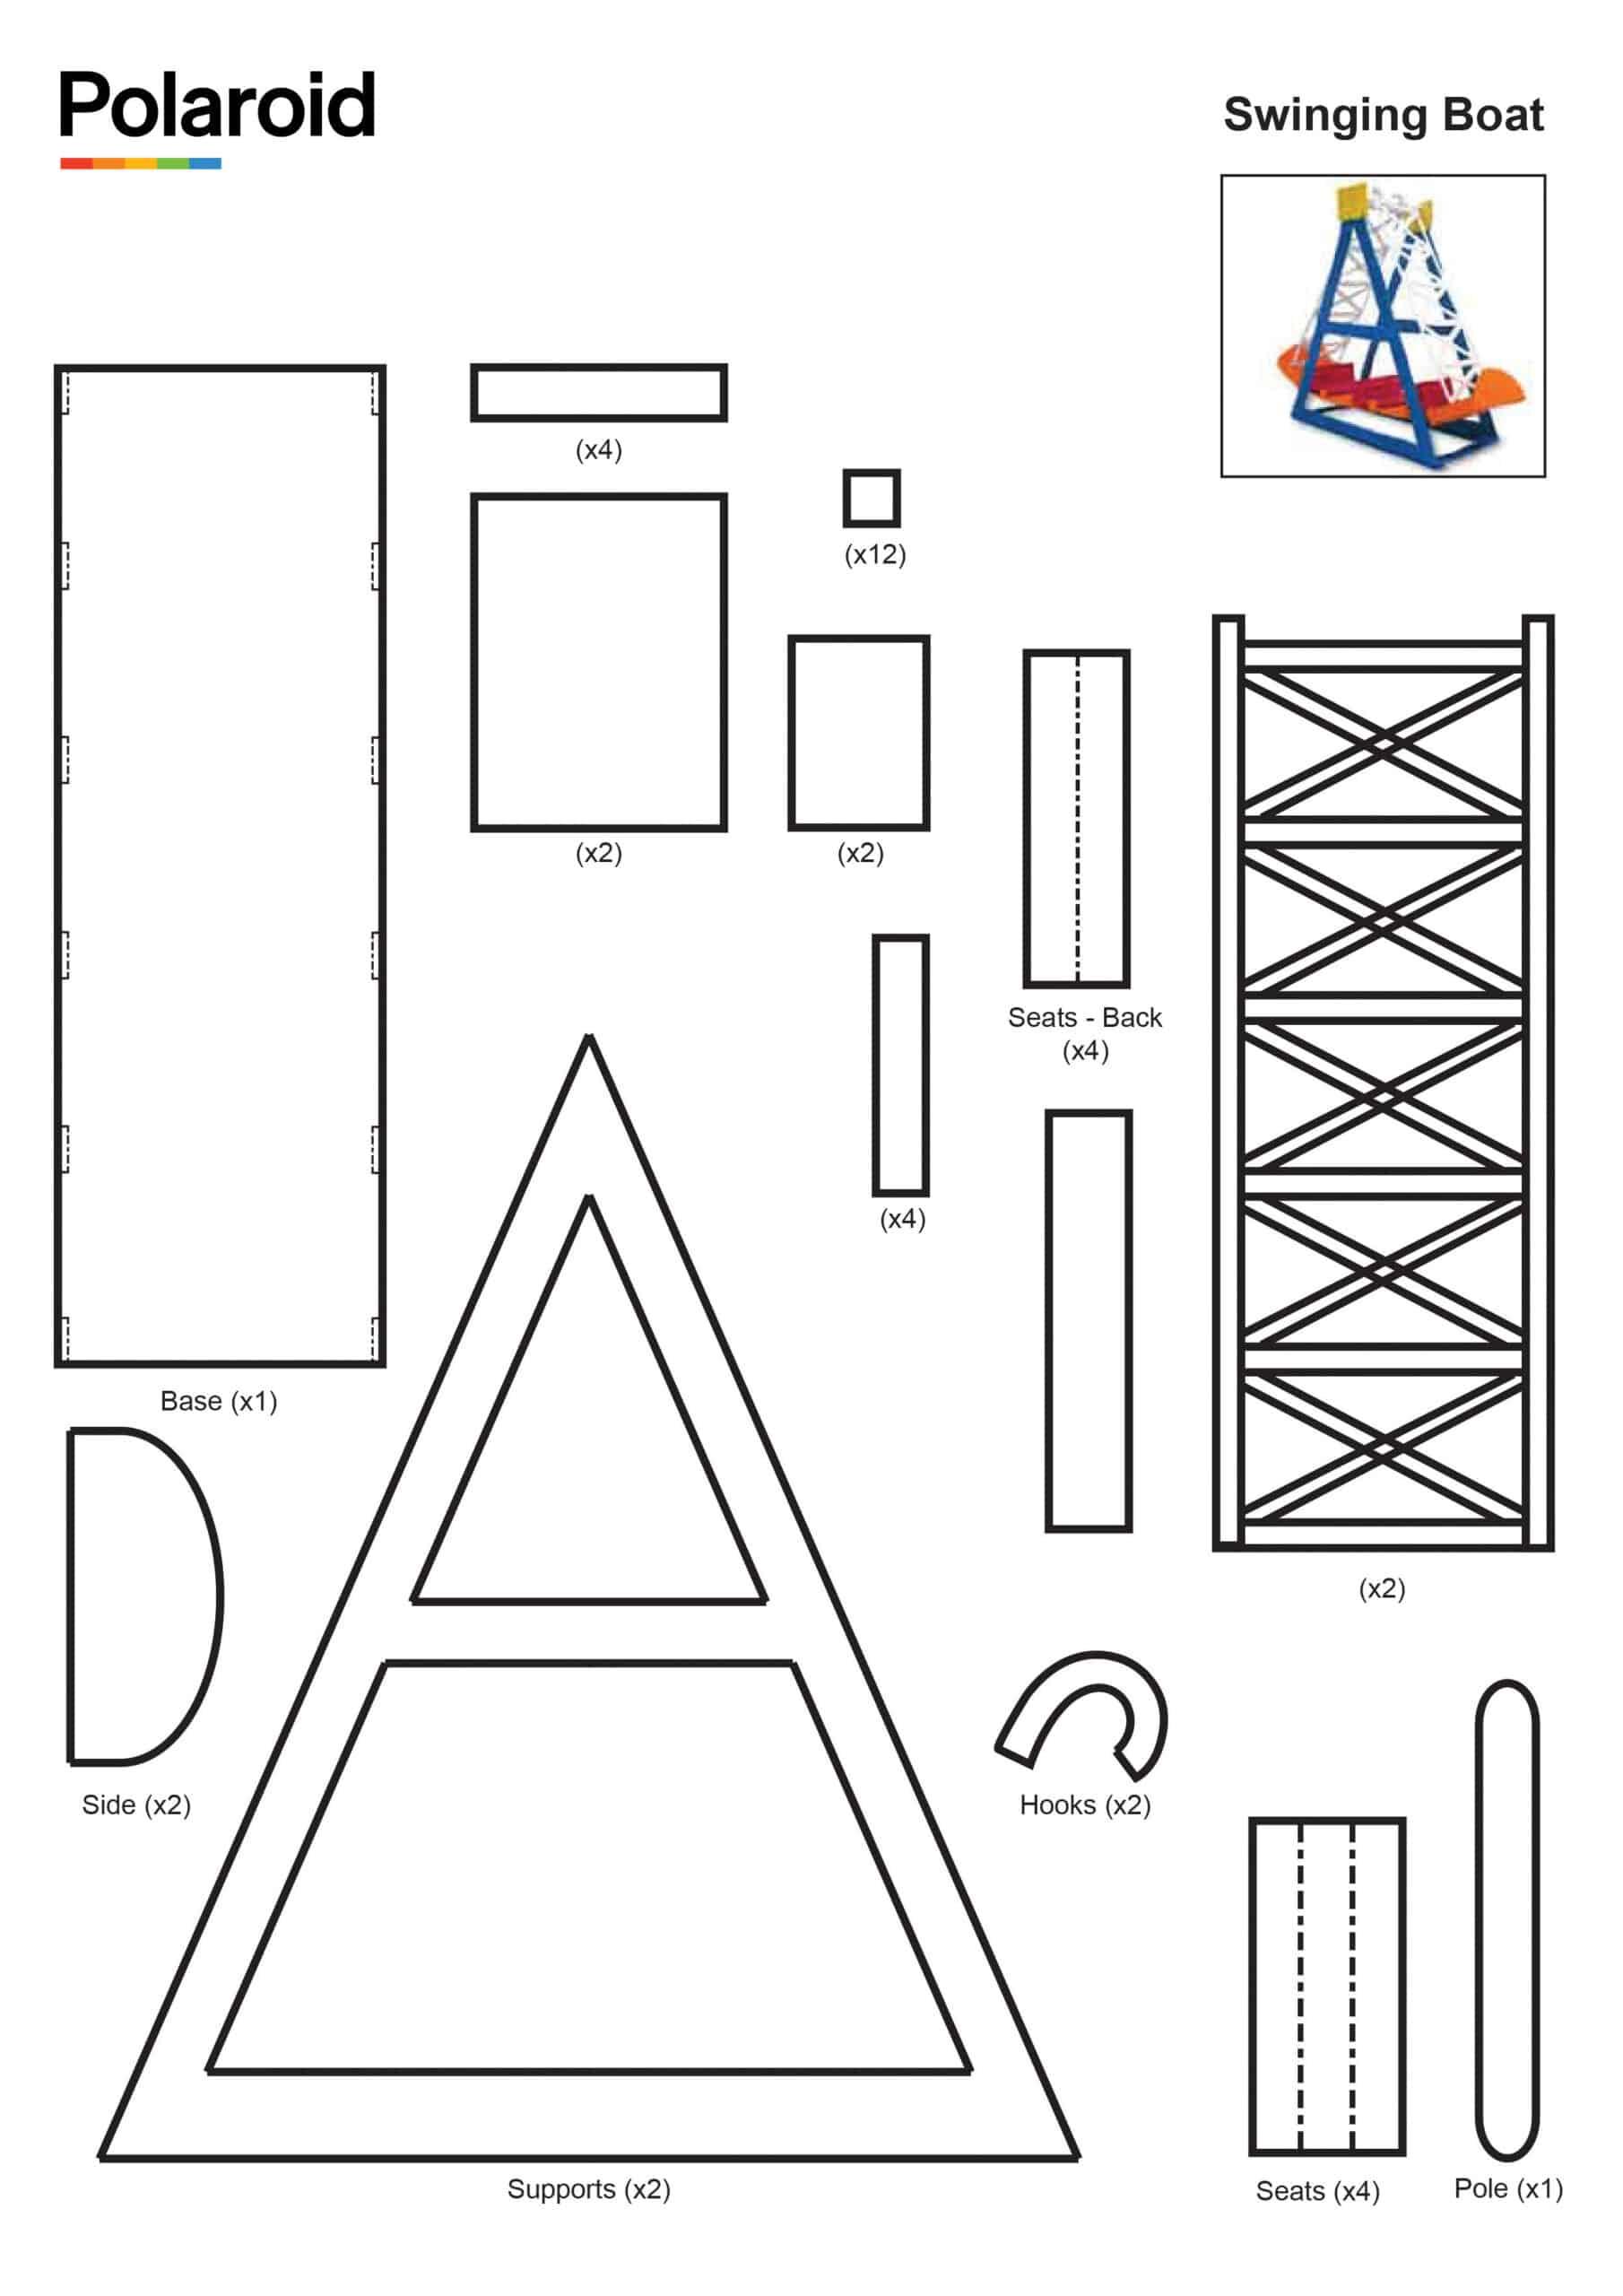 Swinging Boat_New Logo